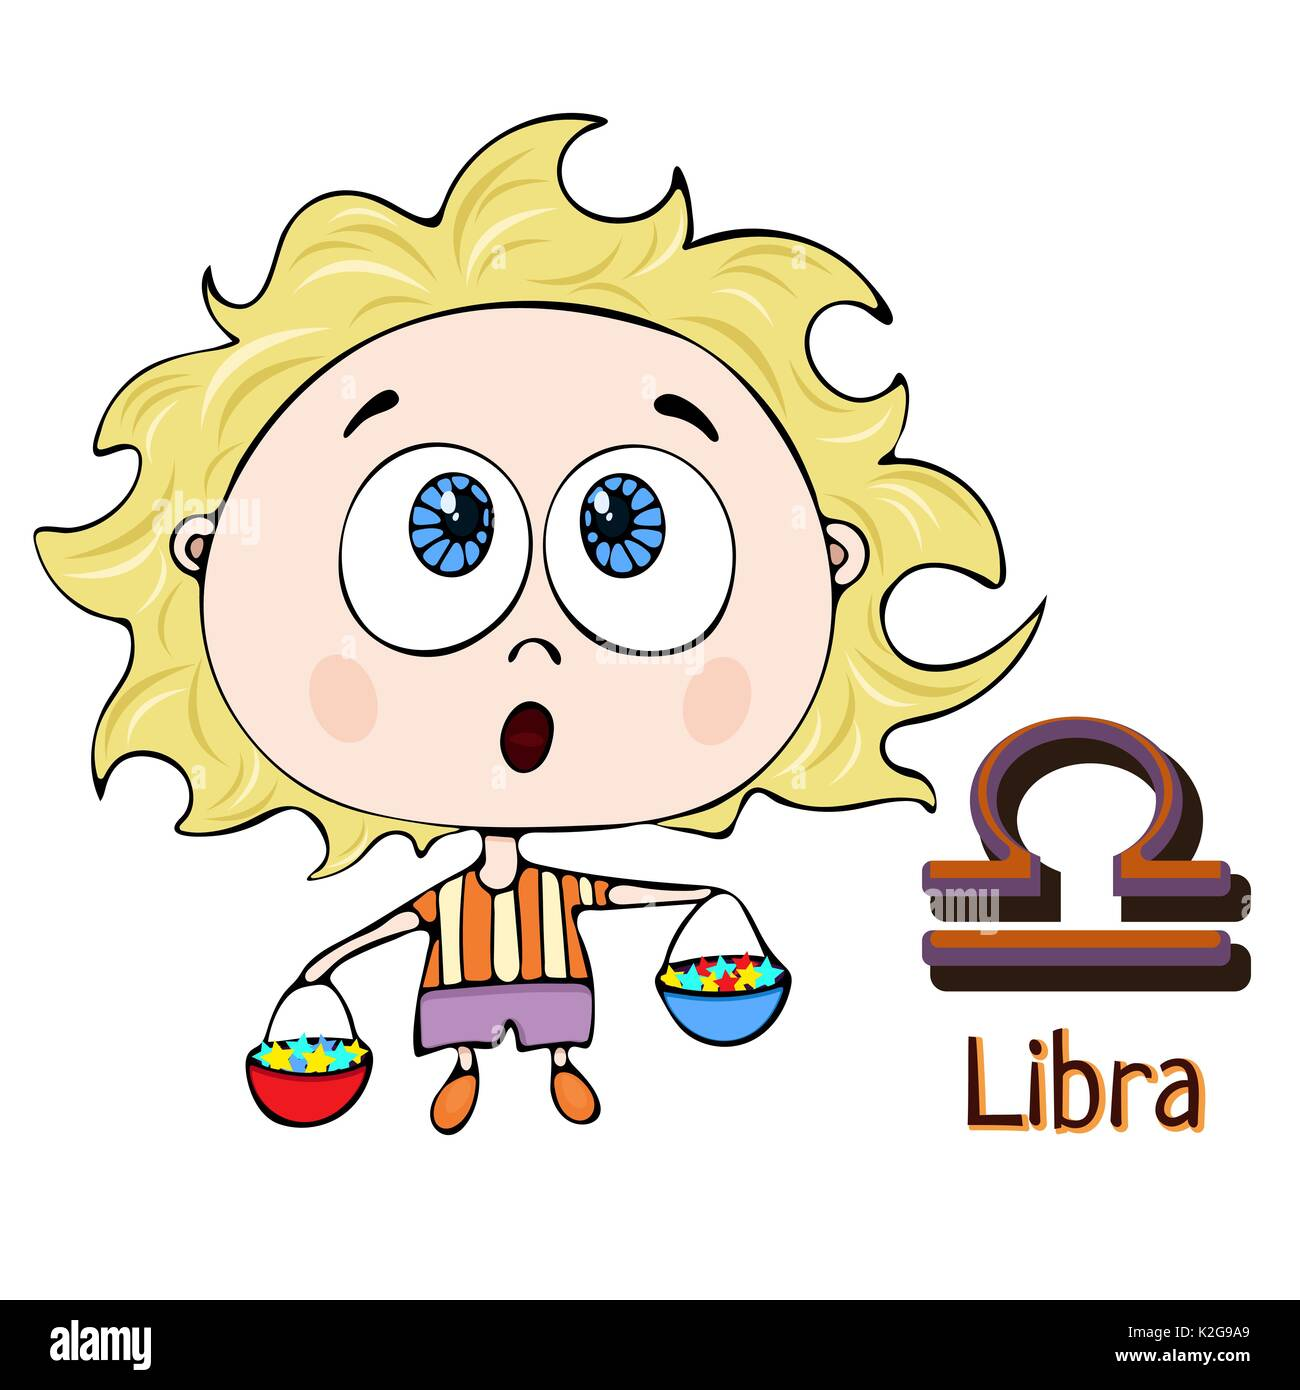 Libra Painted Symbol Zodiac Sign Stock Photos Libra Painted Symbol